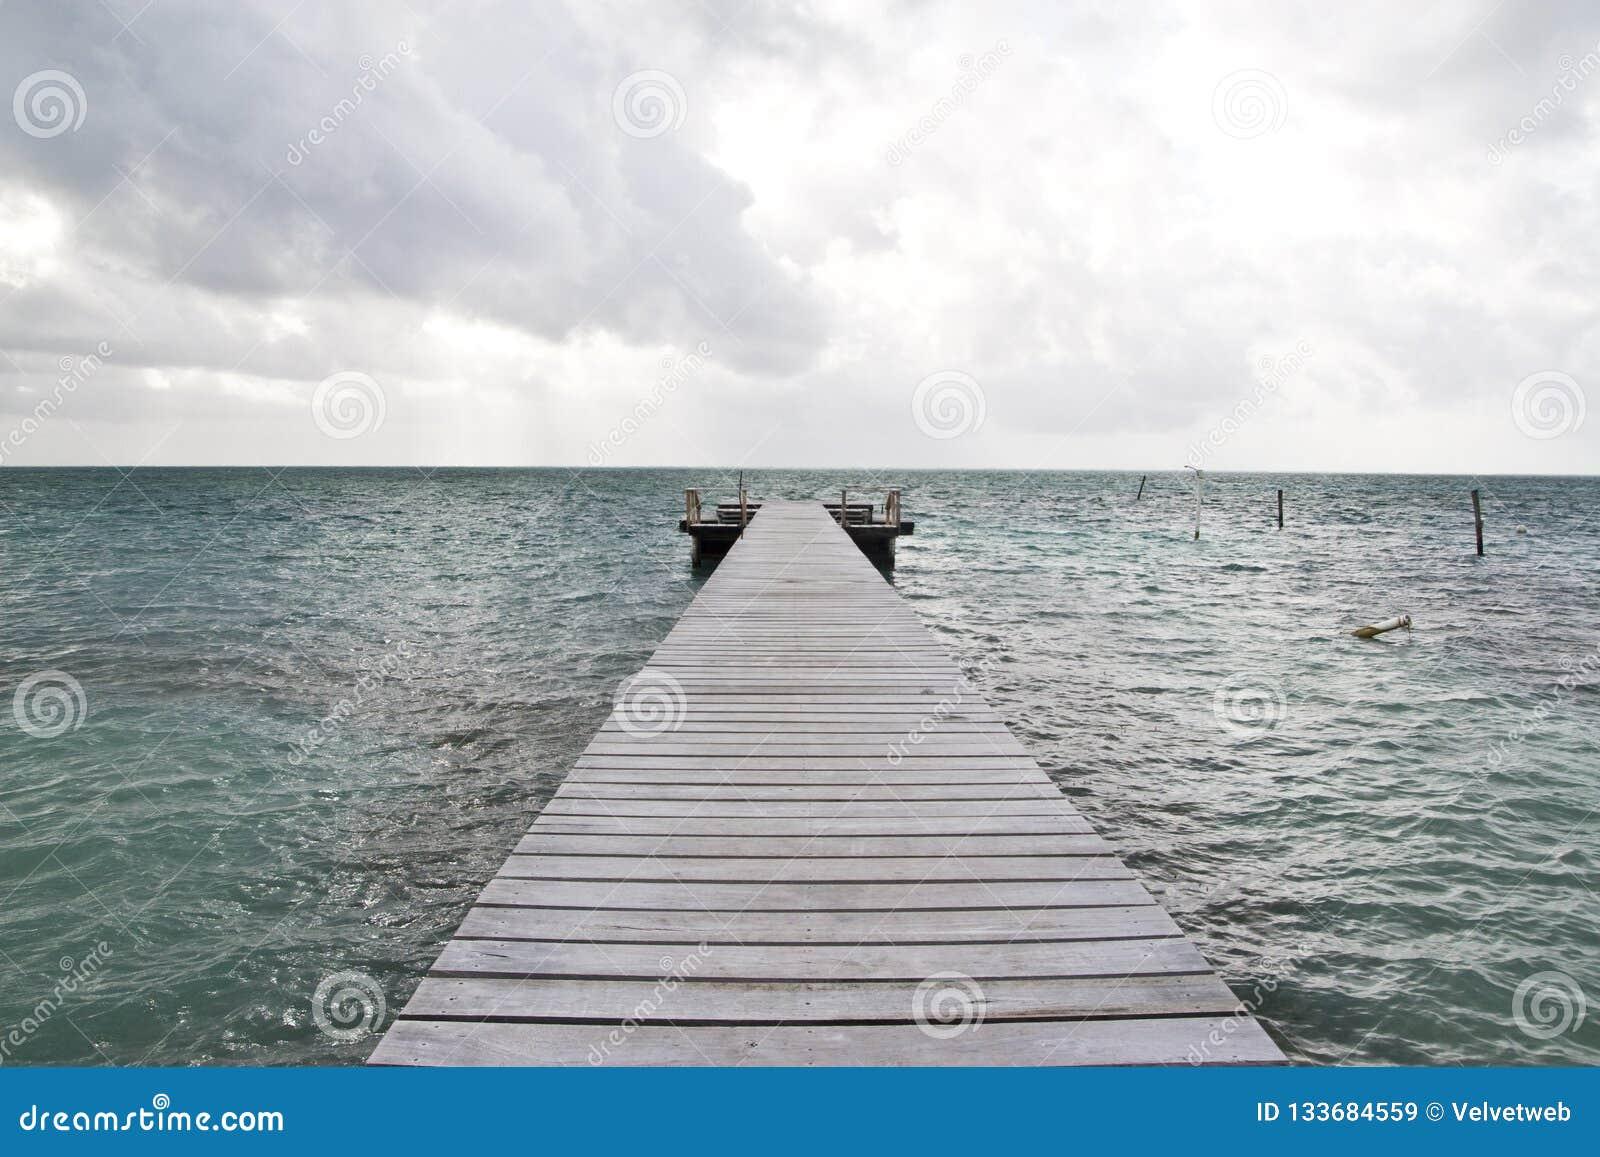 Embarcadero de madera, calafate de Caye